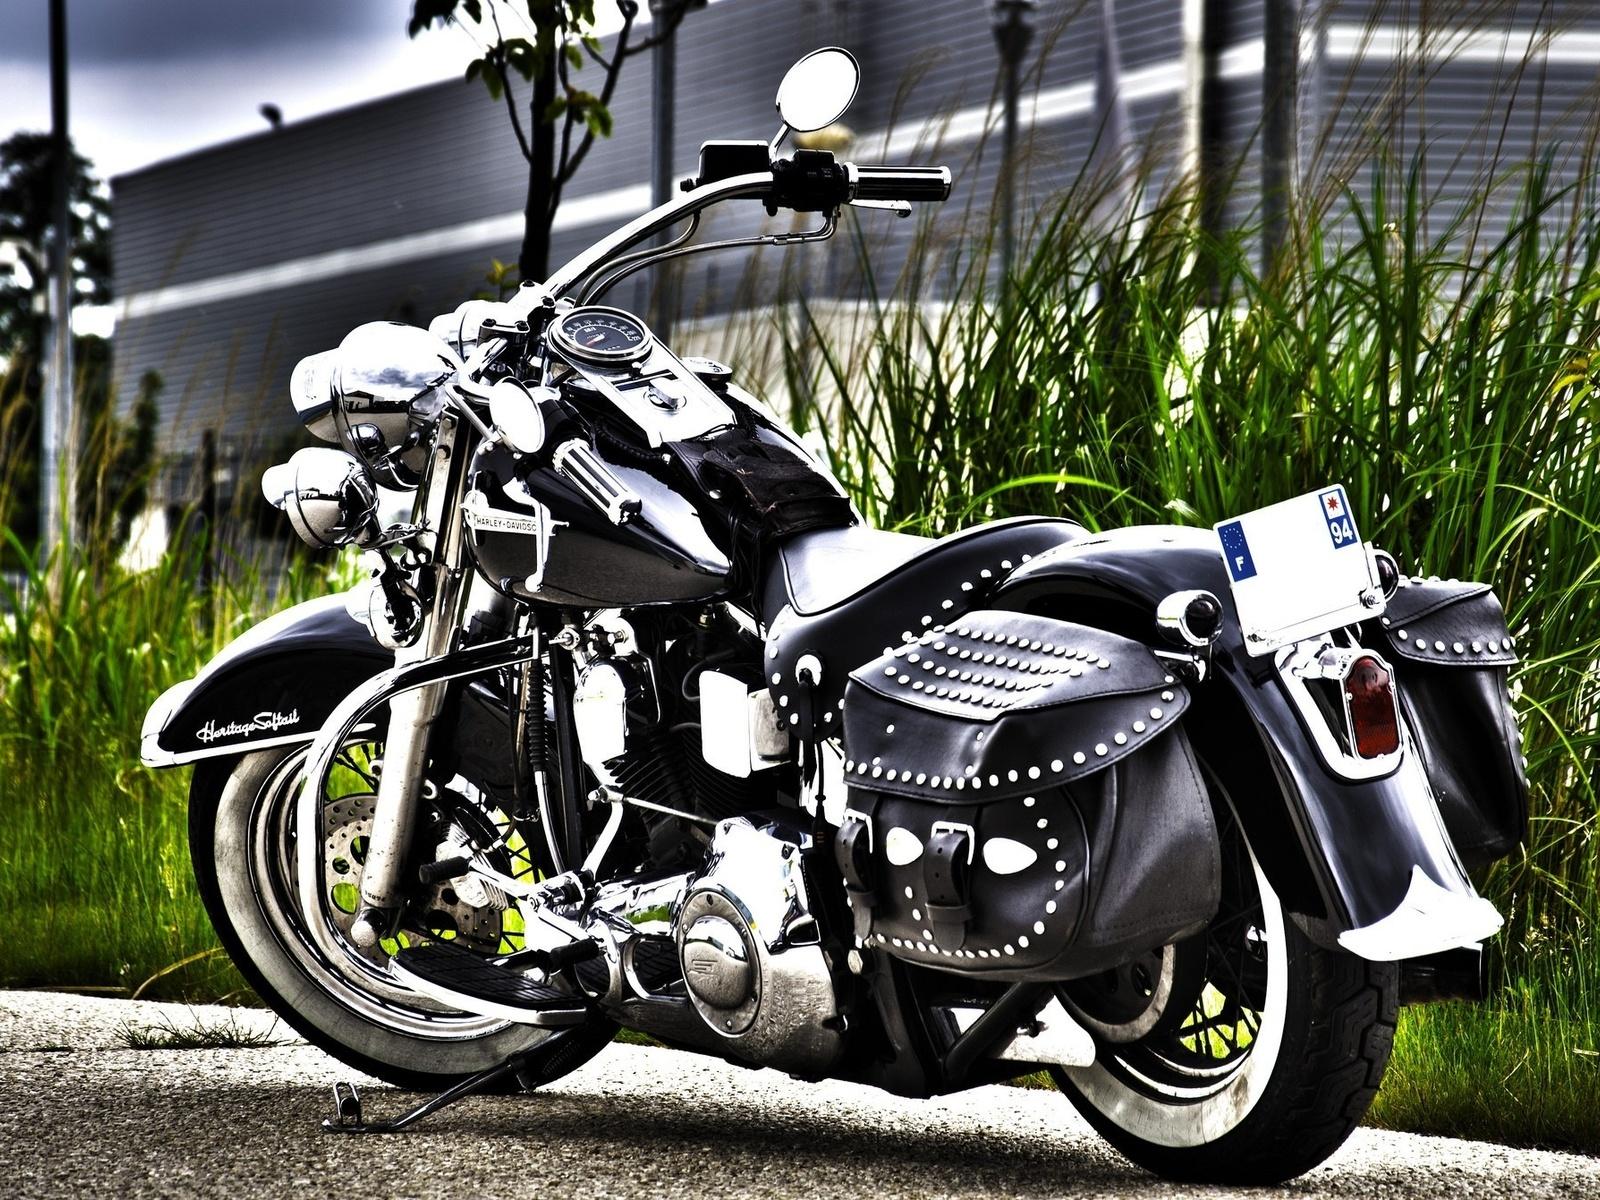 Картинки байкерские мотоциклы, смешными